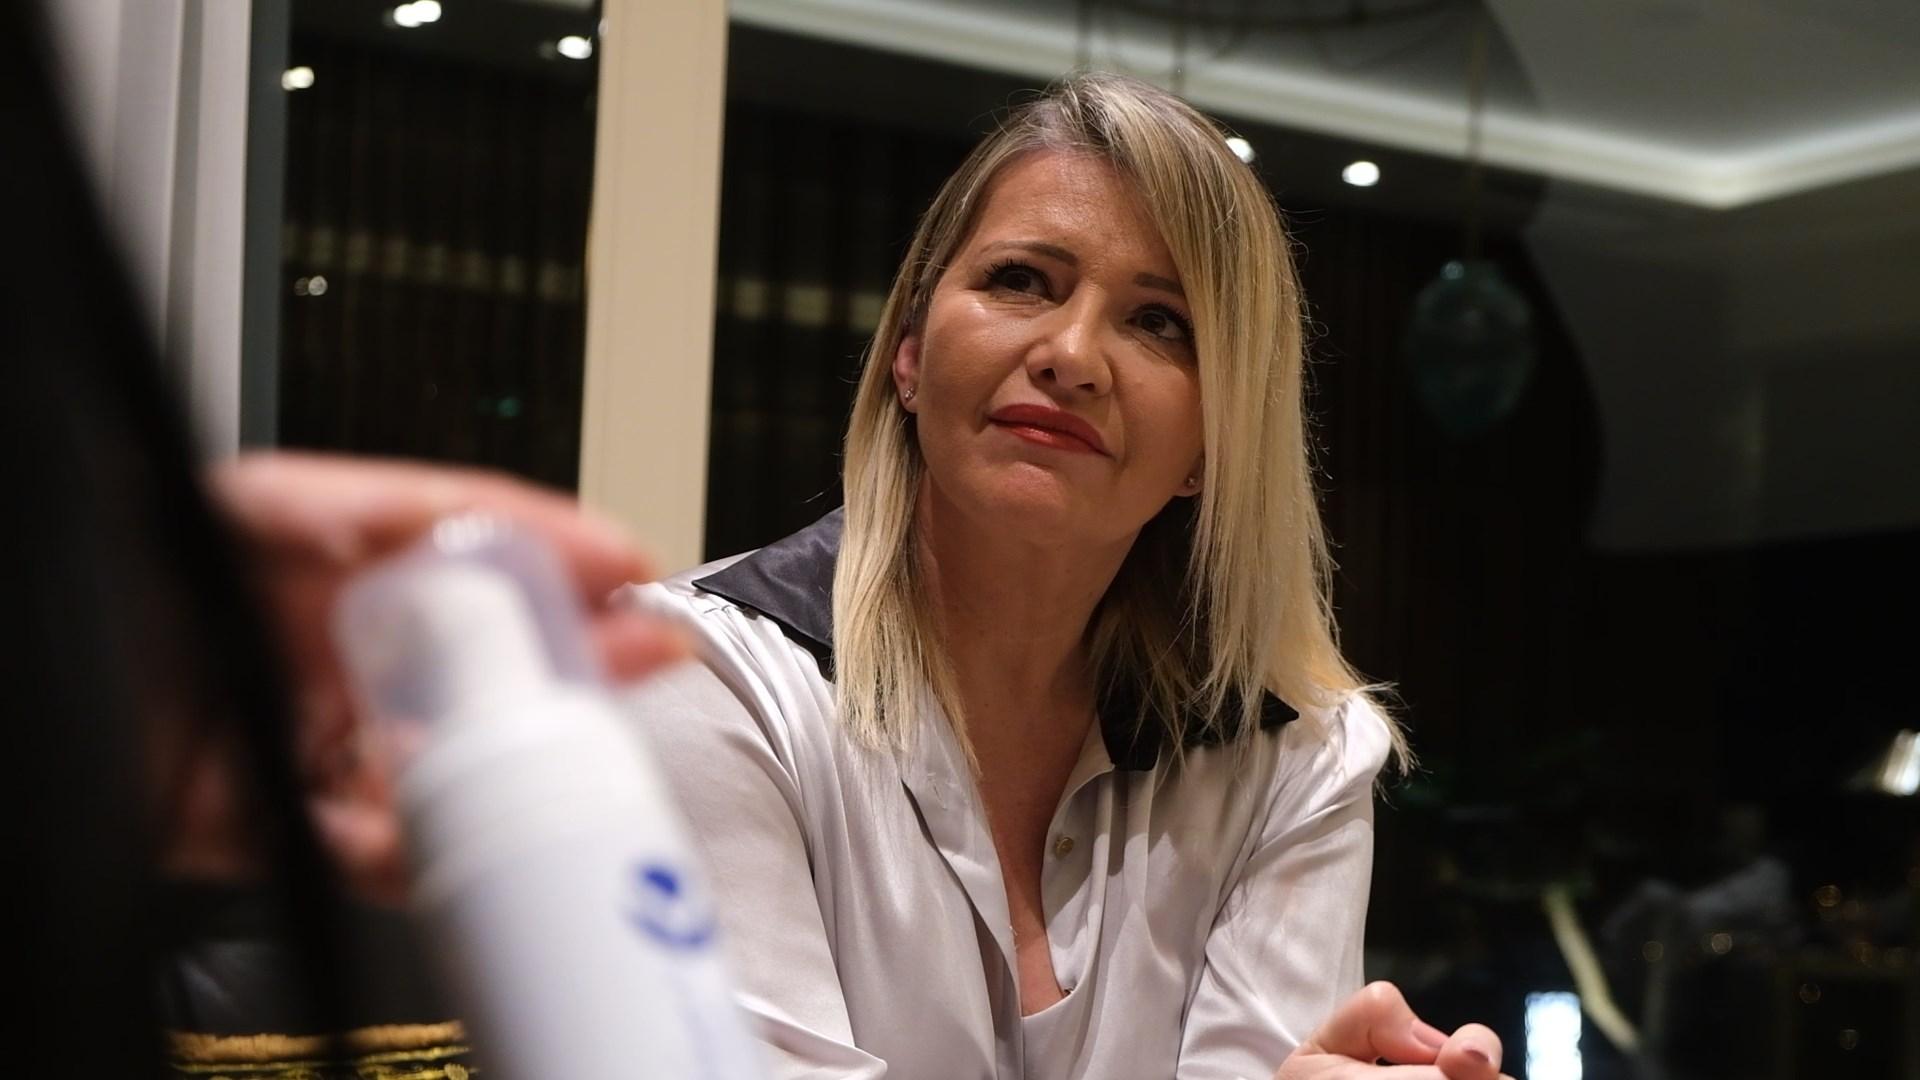 30 pitanja s dr. Vivian Jurković: Snježana Mehun